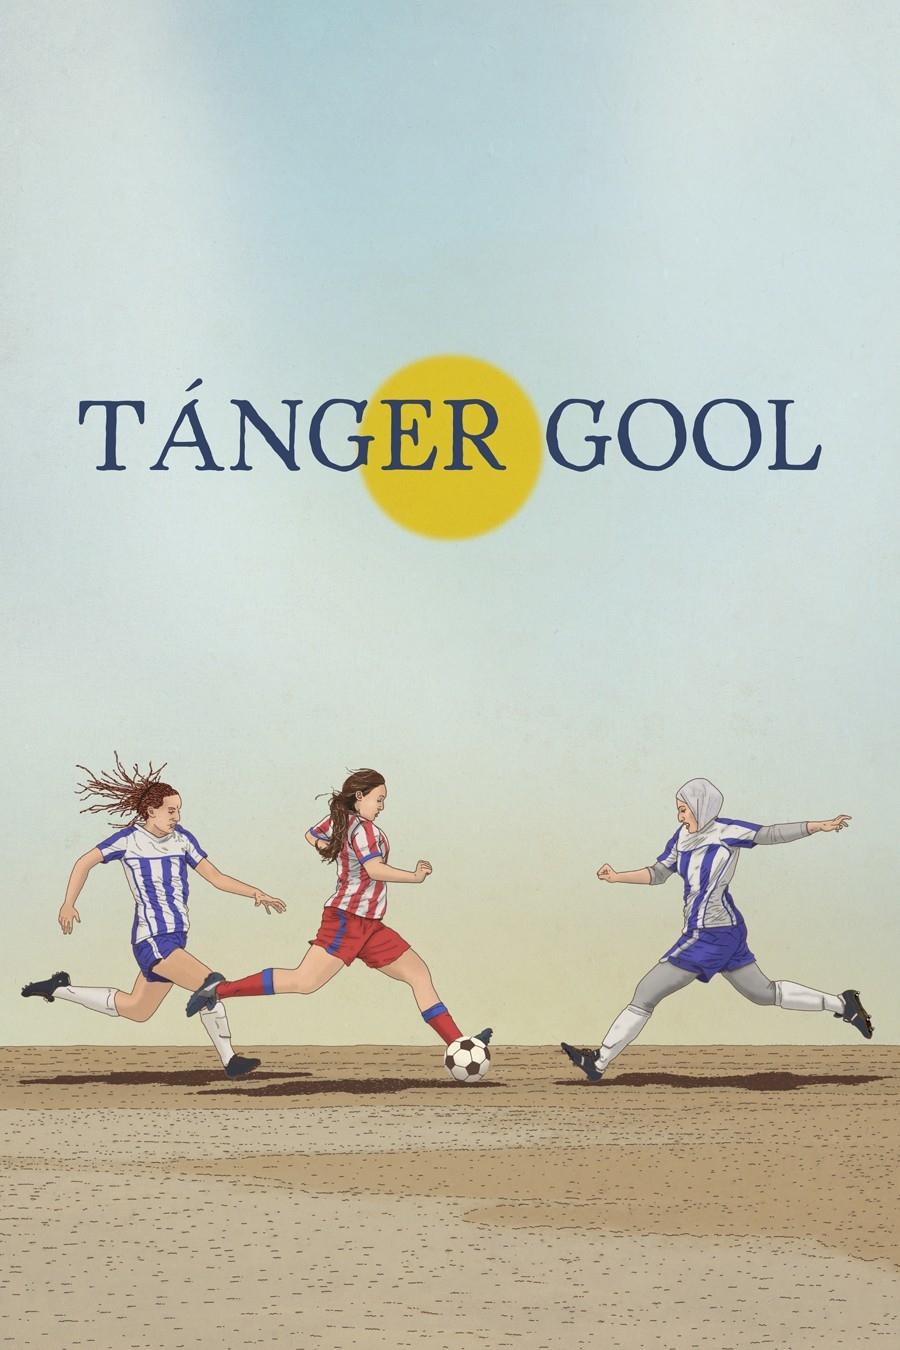 Tánger Gool